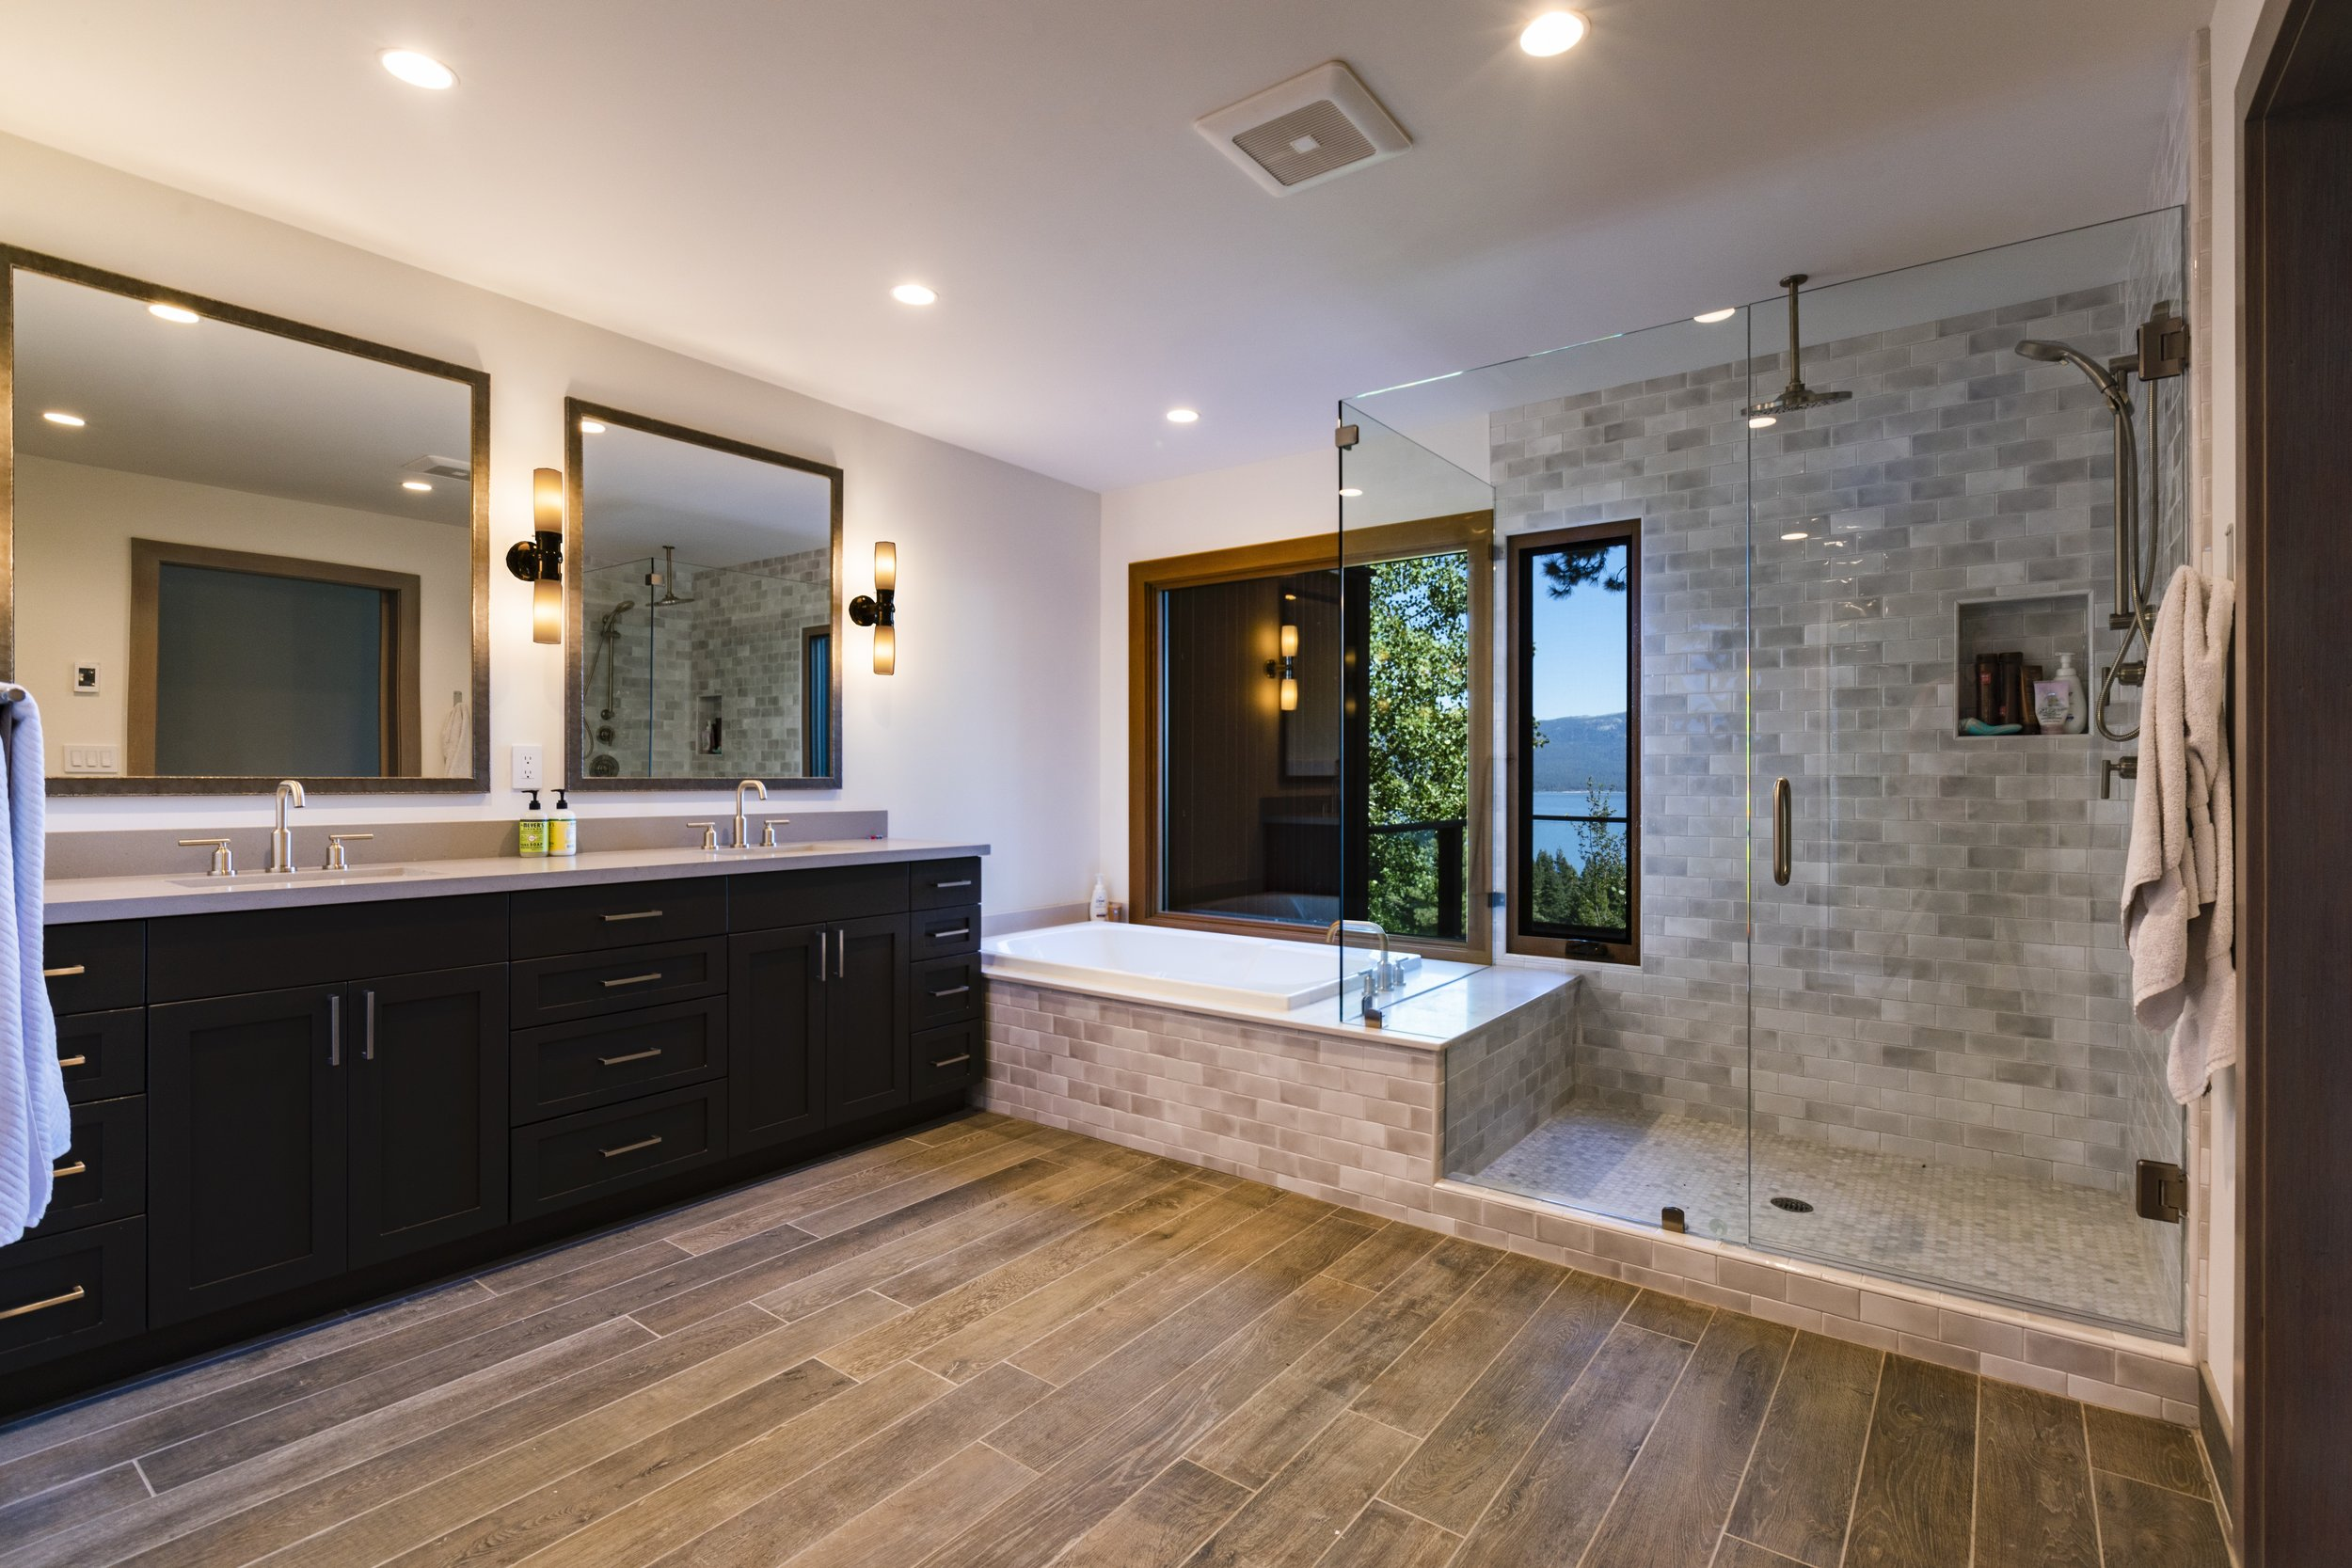 x 5-Hartline-Construction-184-Edgewood-Master-Bathroom.jpg